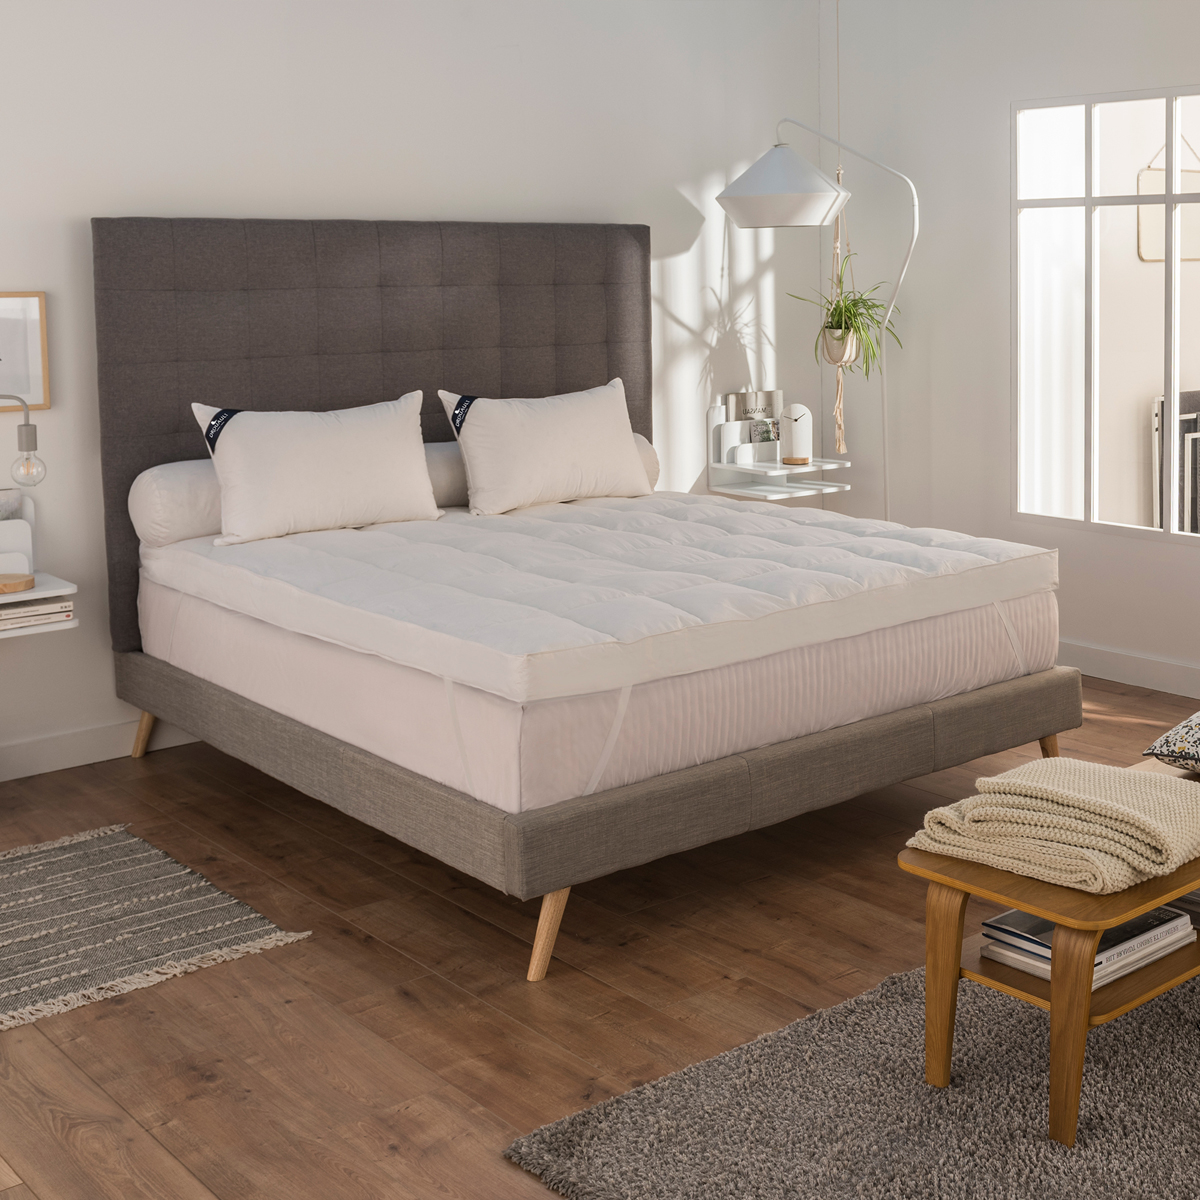 Surconfort de Matelas Haut Luxe Pro 90x190 cm